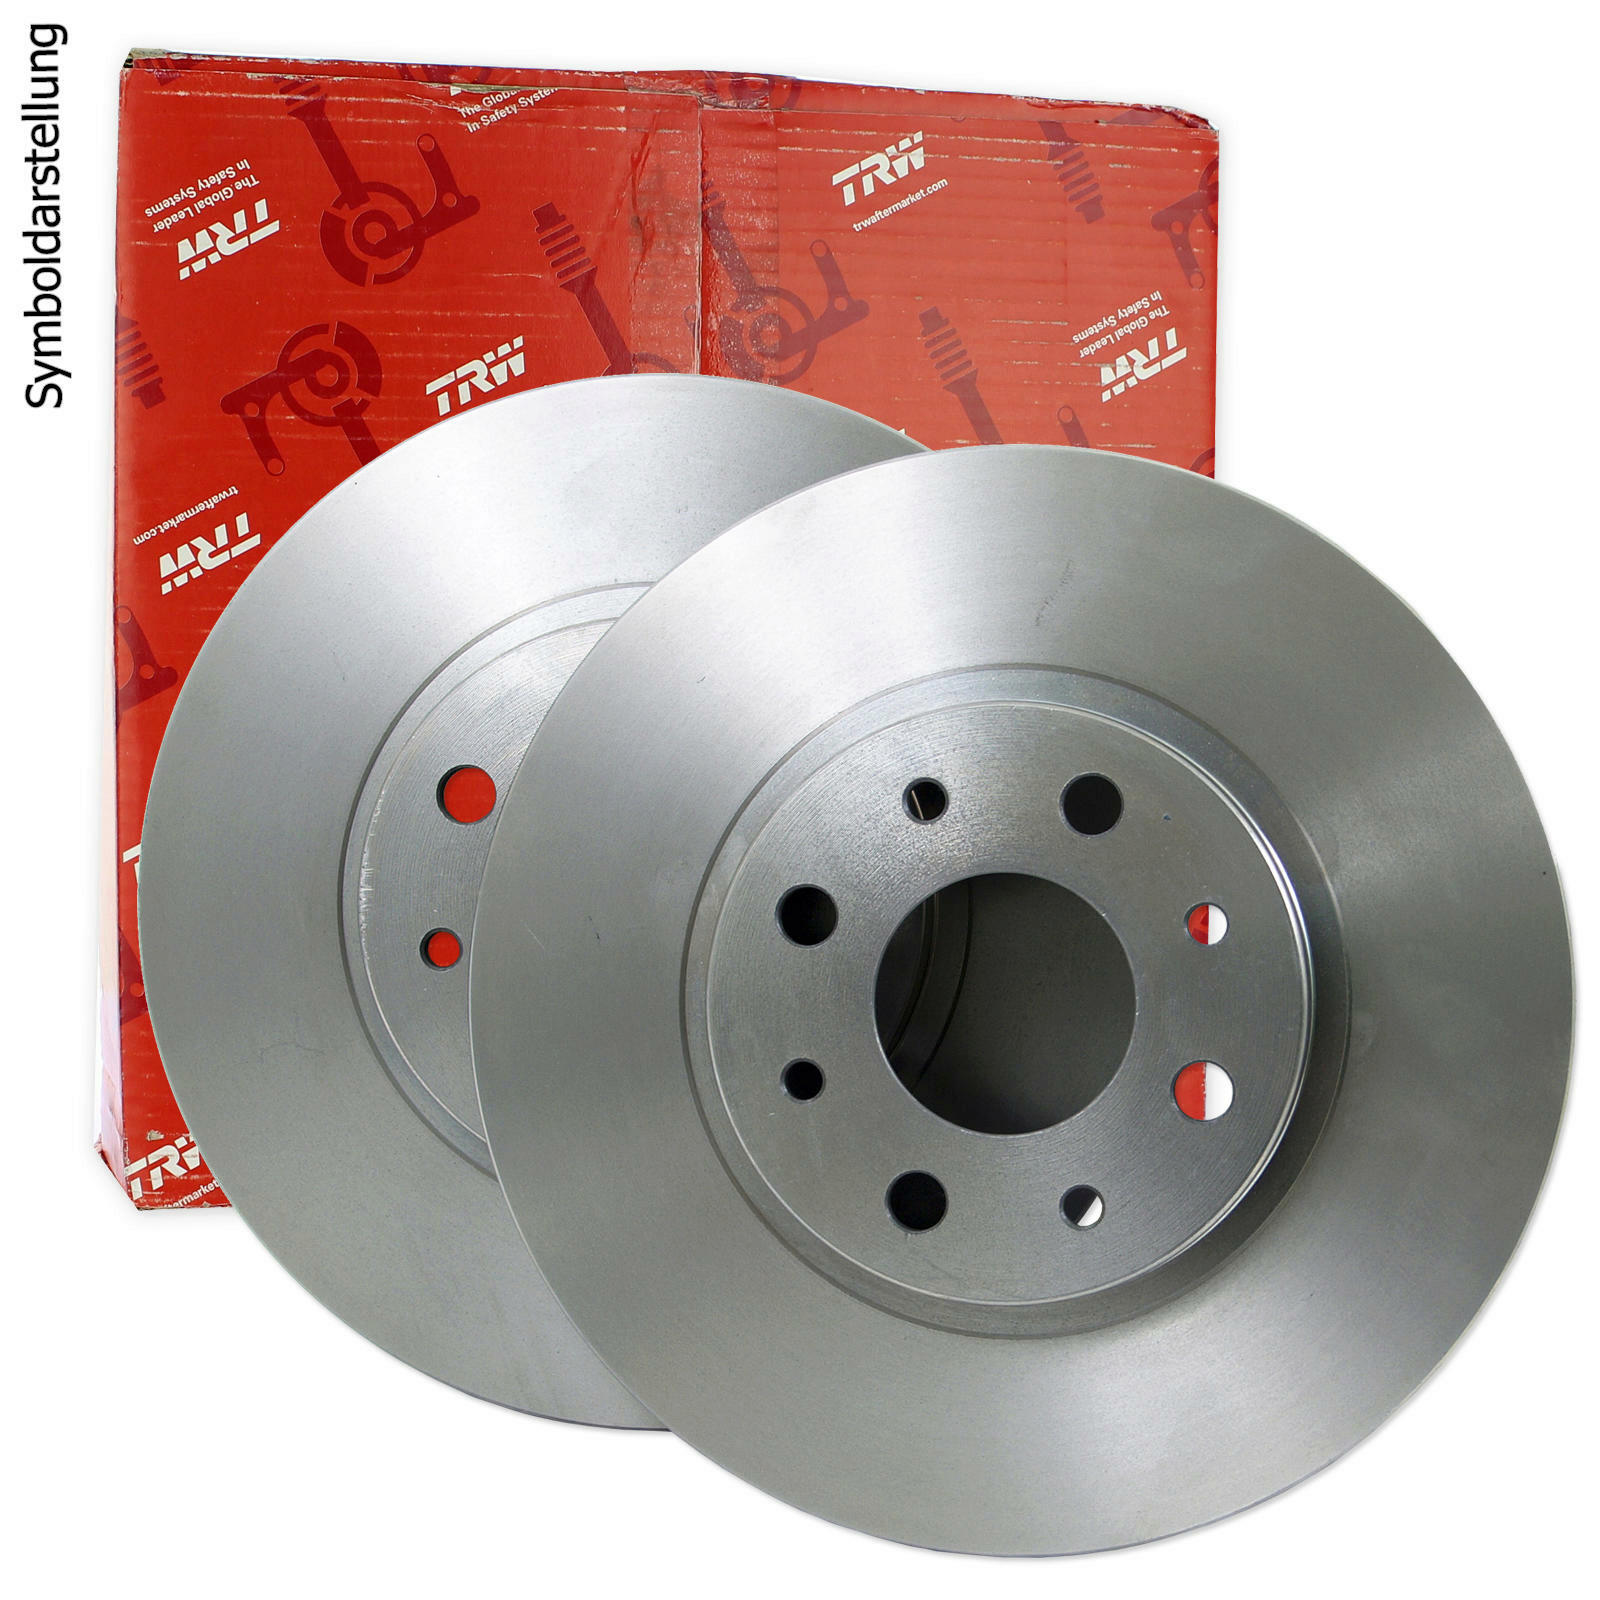 2x TRW Brake Disc